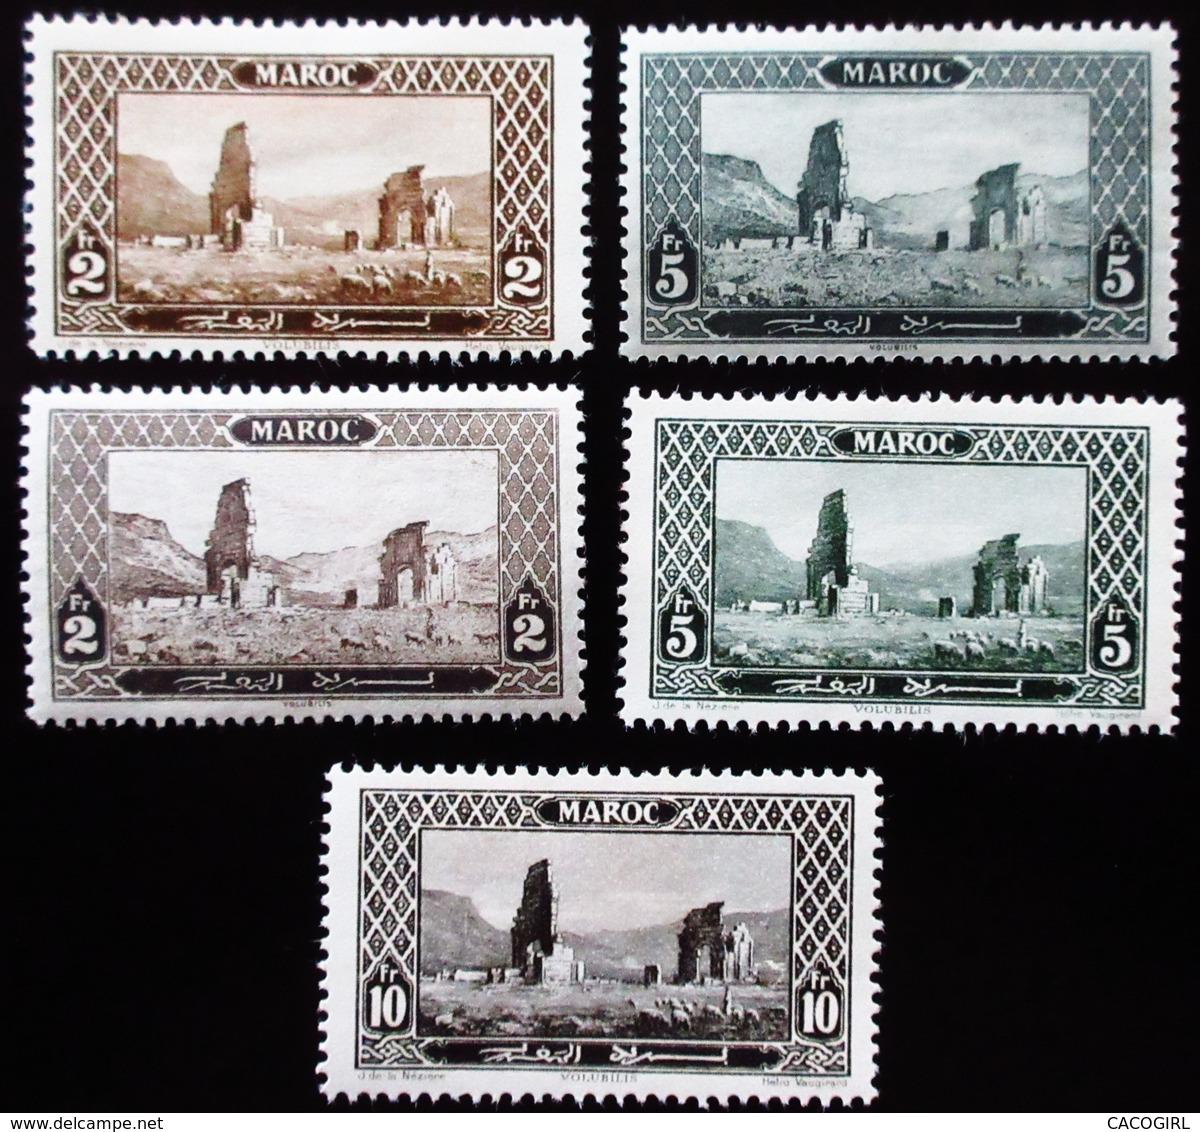 Maroc  . Ruins Of Volubilis . 5 Valeurs Avec Variantes Fr/fr Et Fond    Neuf Trace Charnière - Maroc (1891-1956)